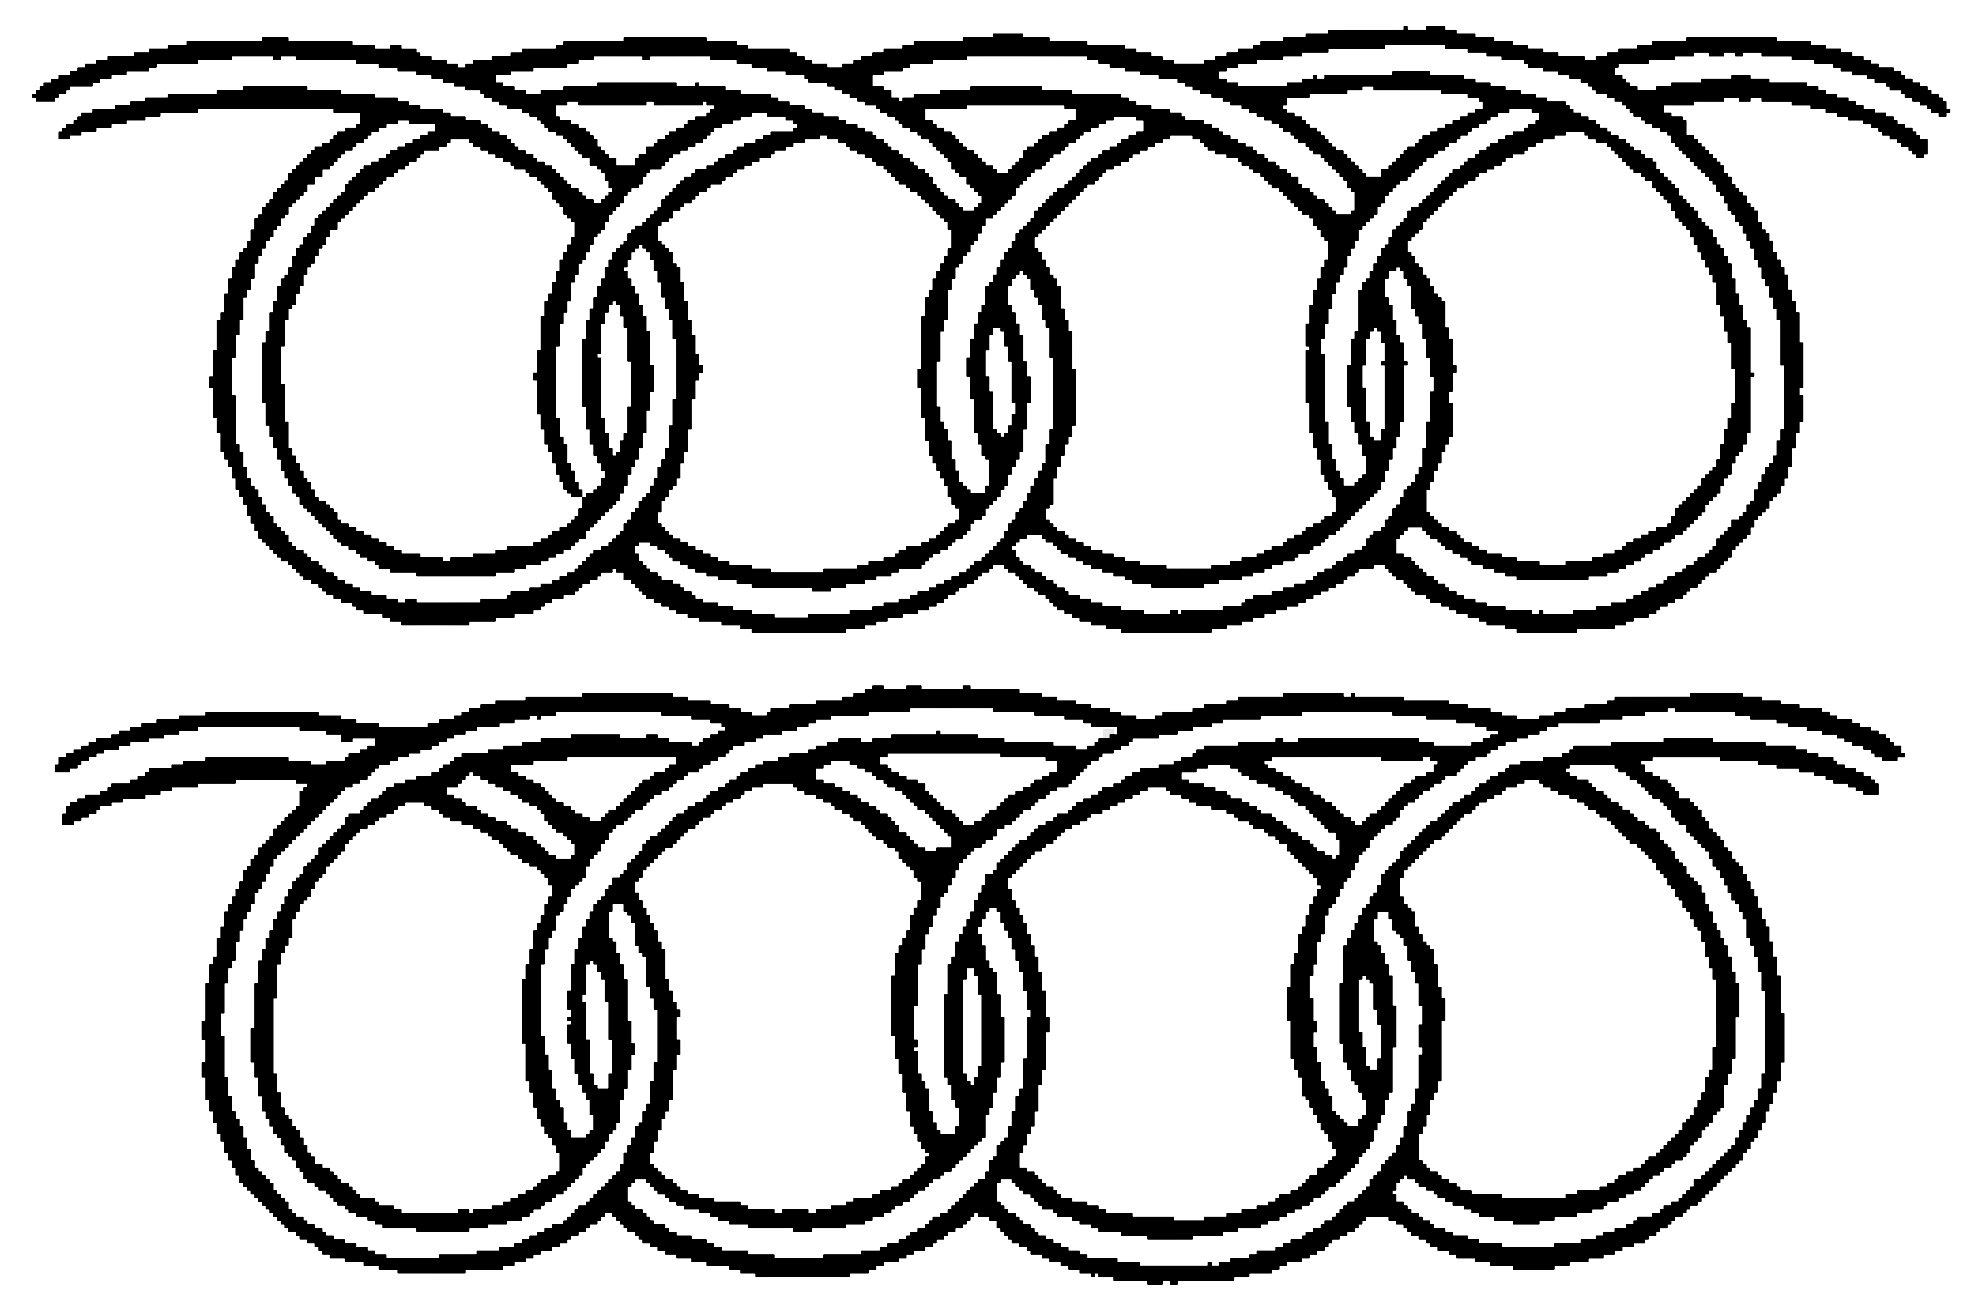 tait-chain.jpg